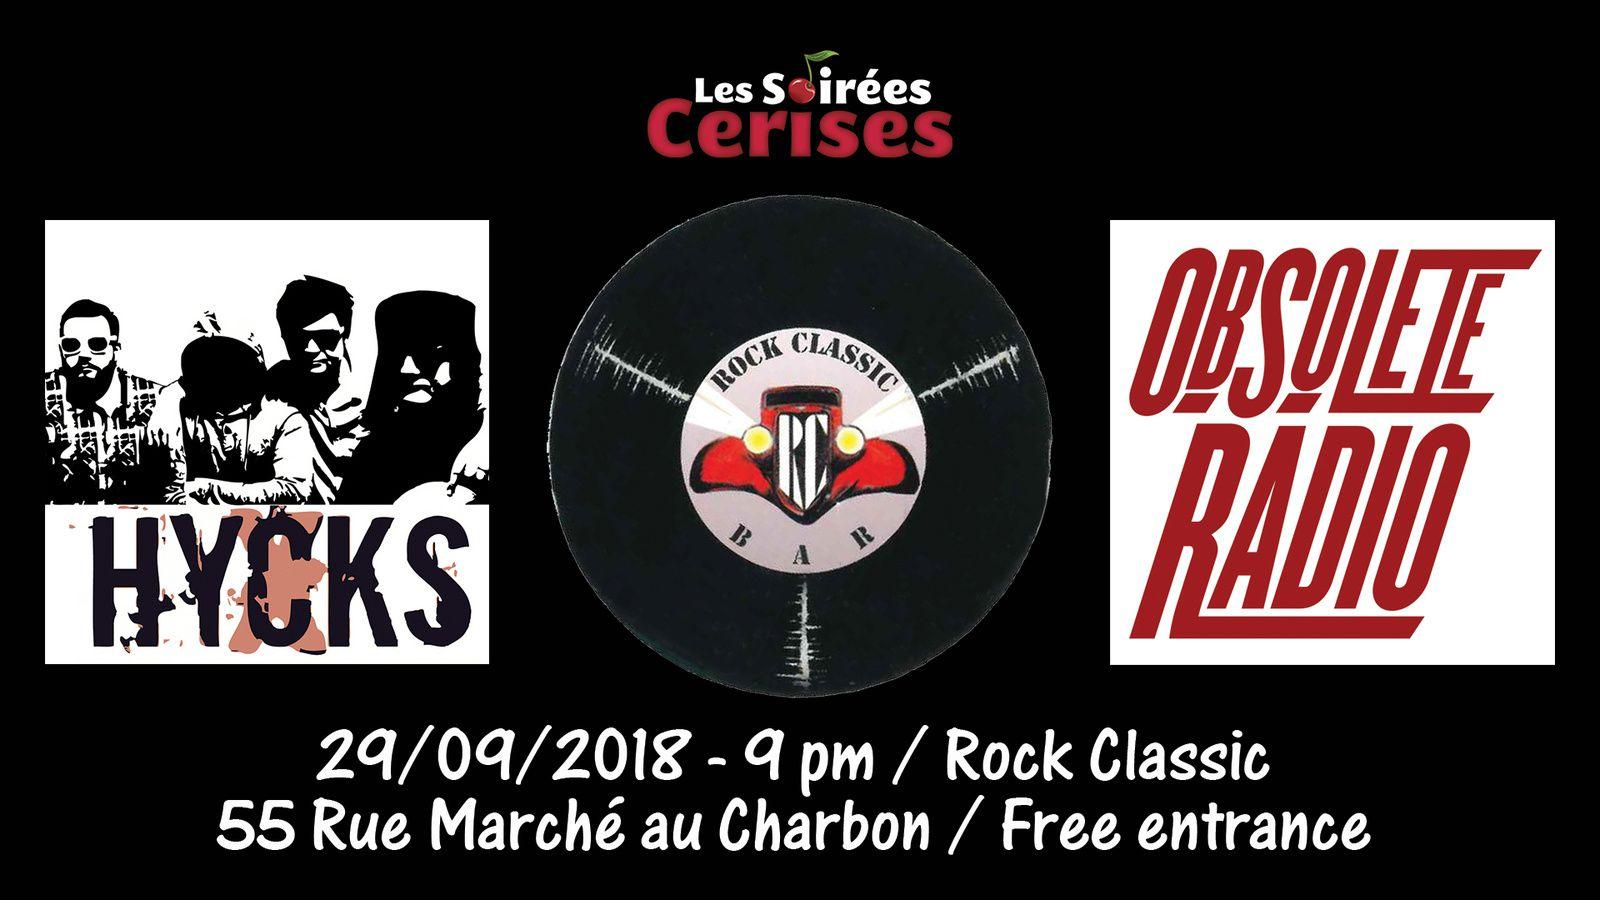 ▶ Obsolete radio (F) + Hycks (F) @ Rock Classic - 29/09/2018 - 21h00 - Entrée gratuite / Free entrance